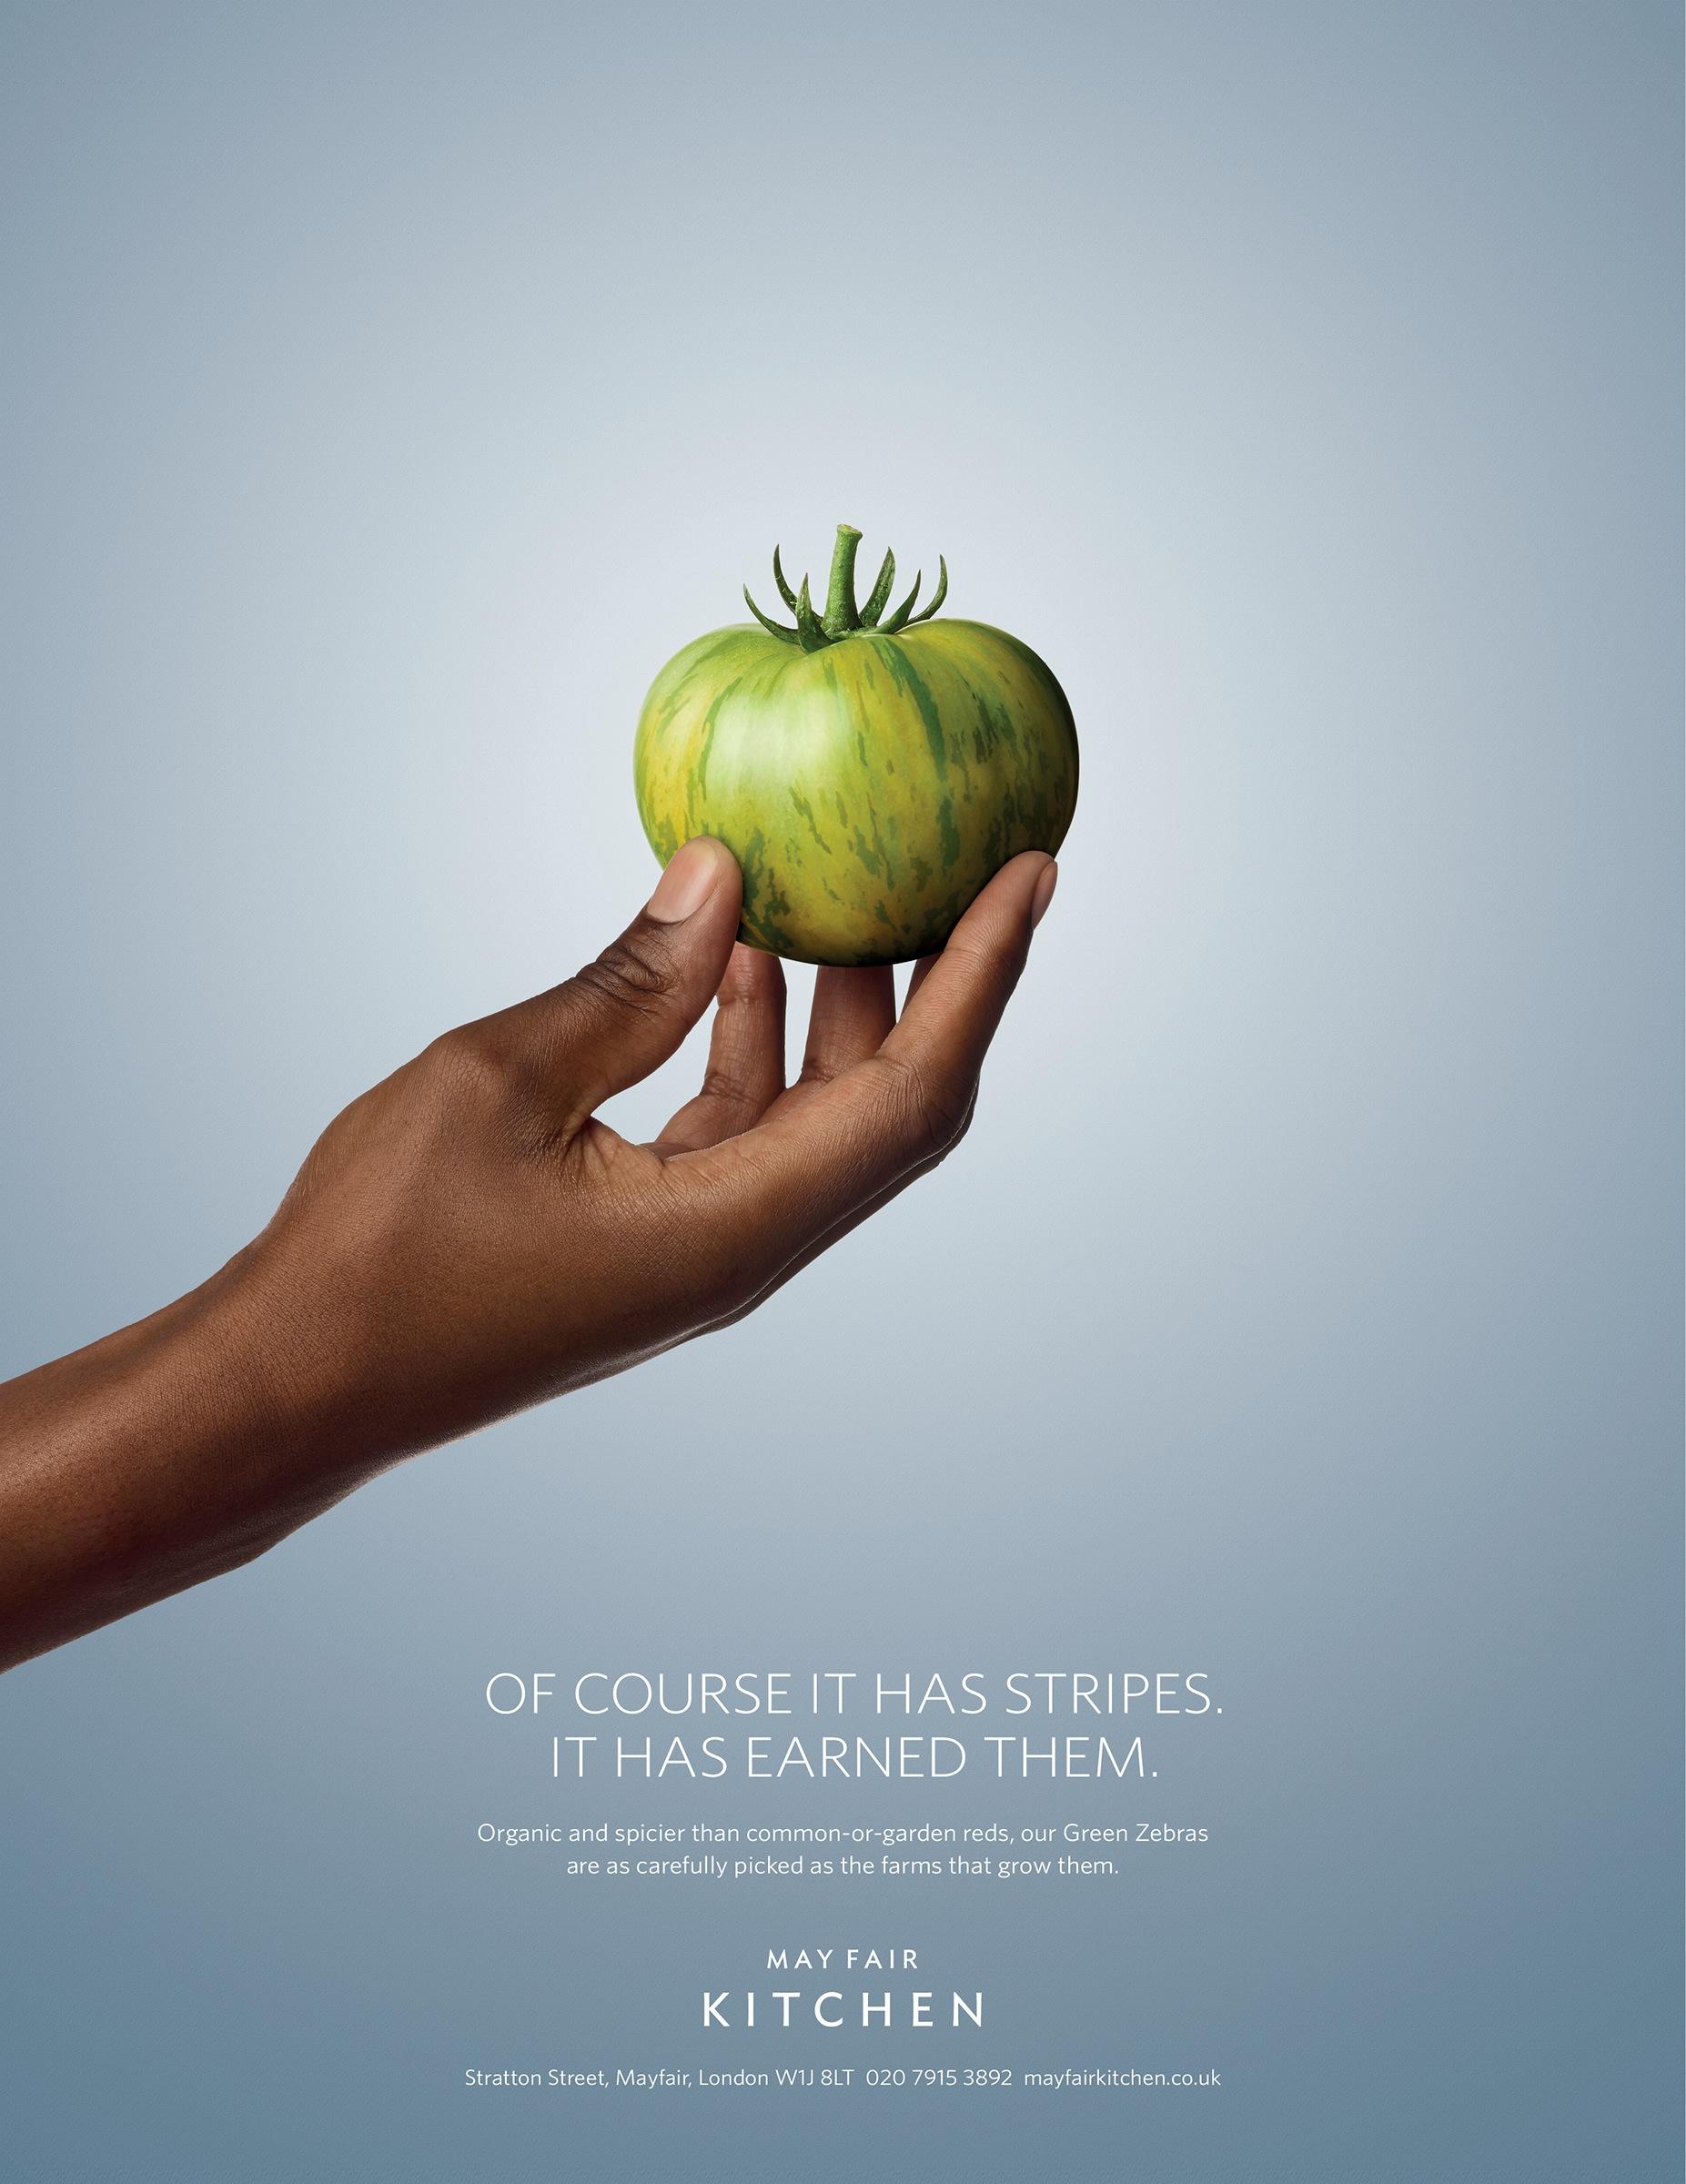 May Fair Kitchen Print Advert By Saatchi & Saatchi: Tomato   Ads of ...